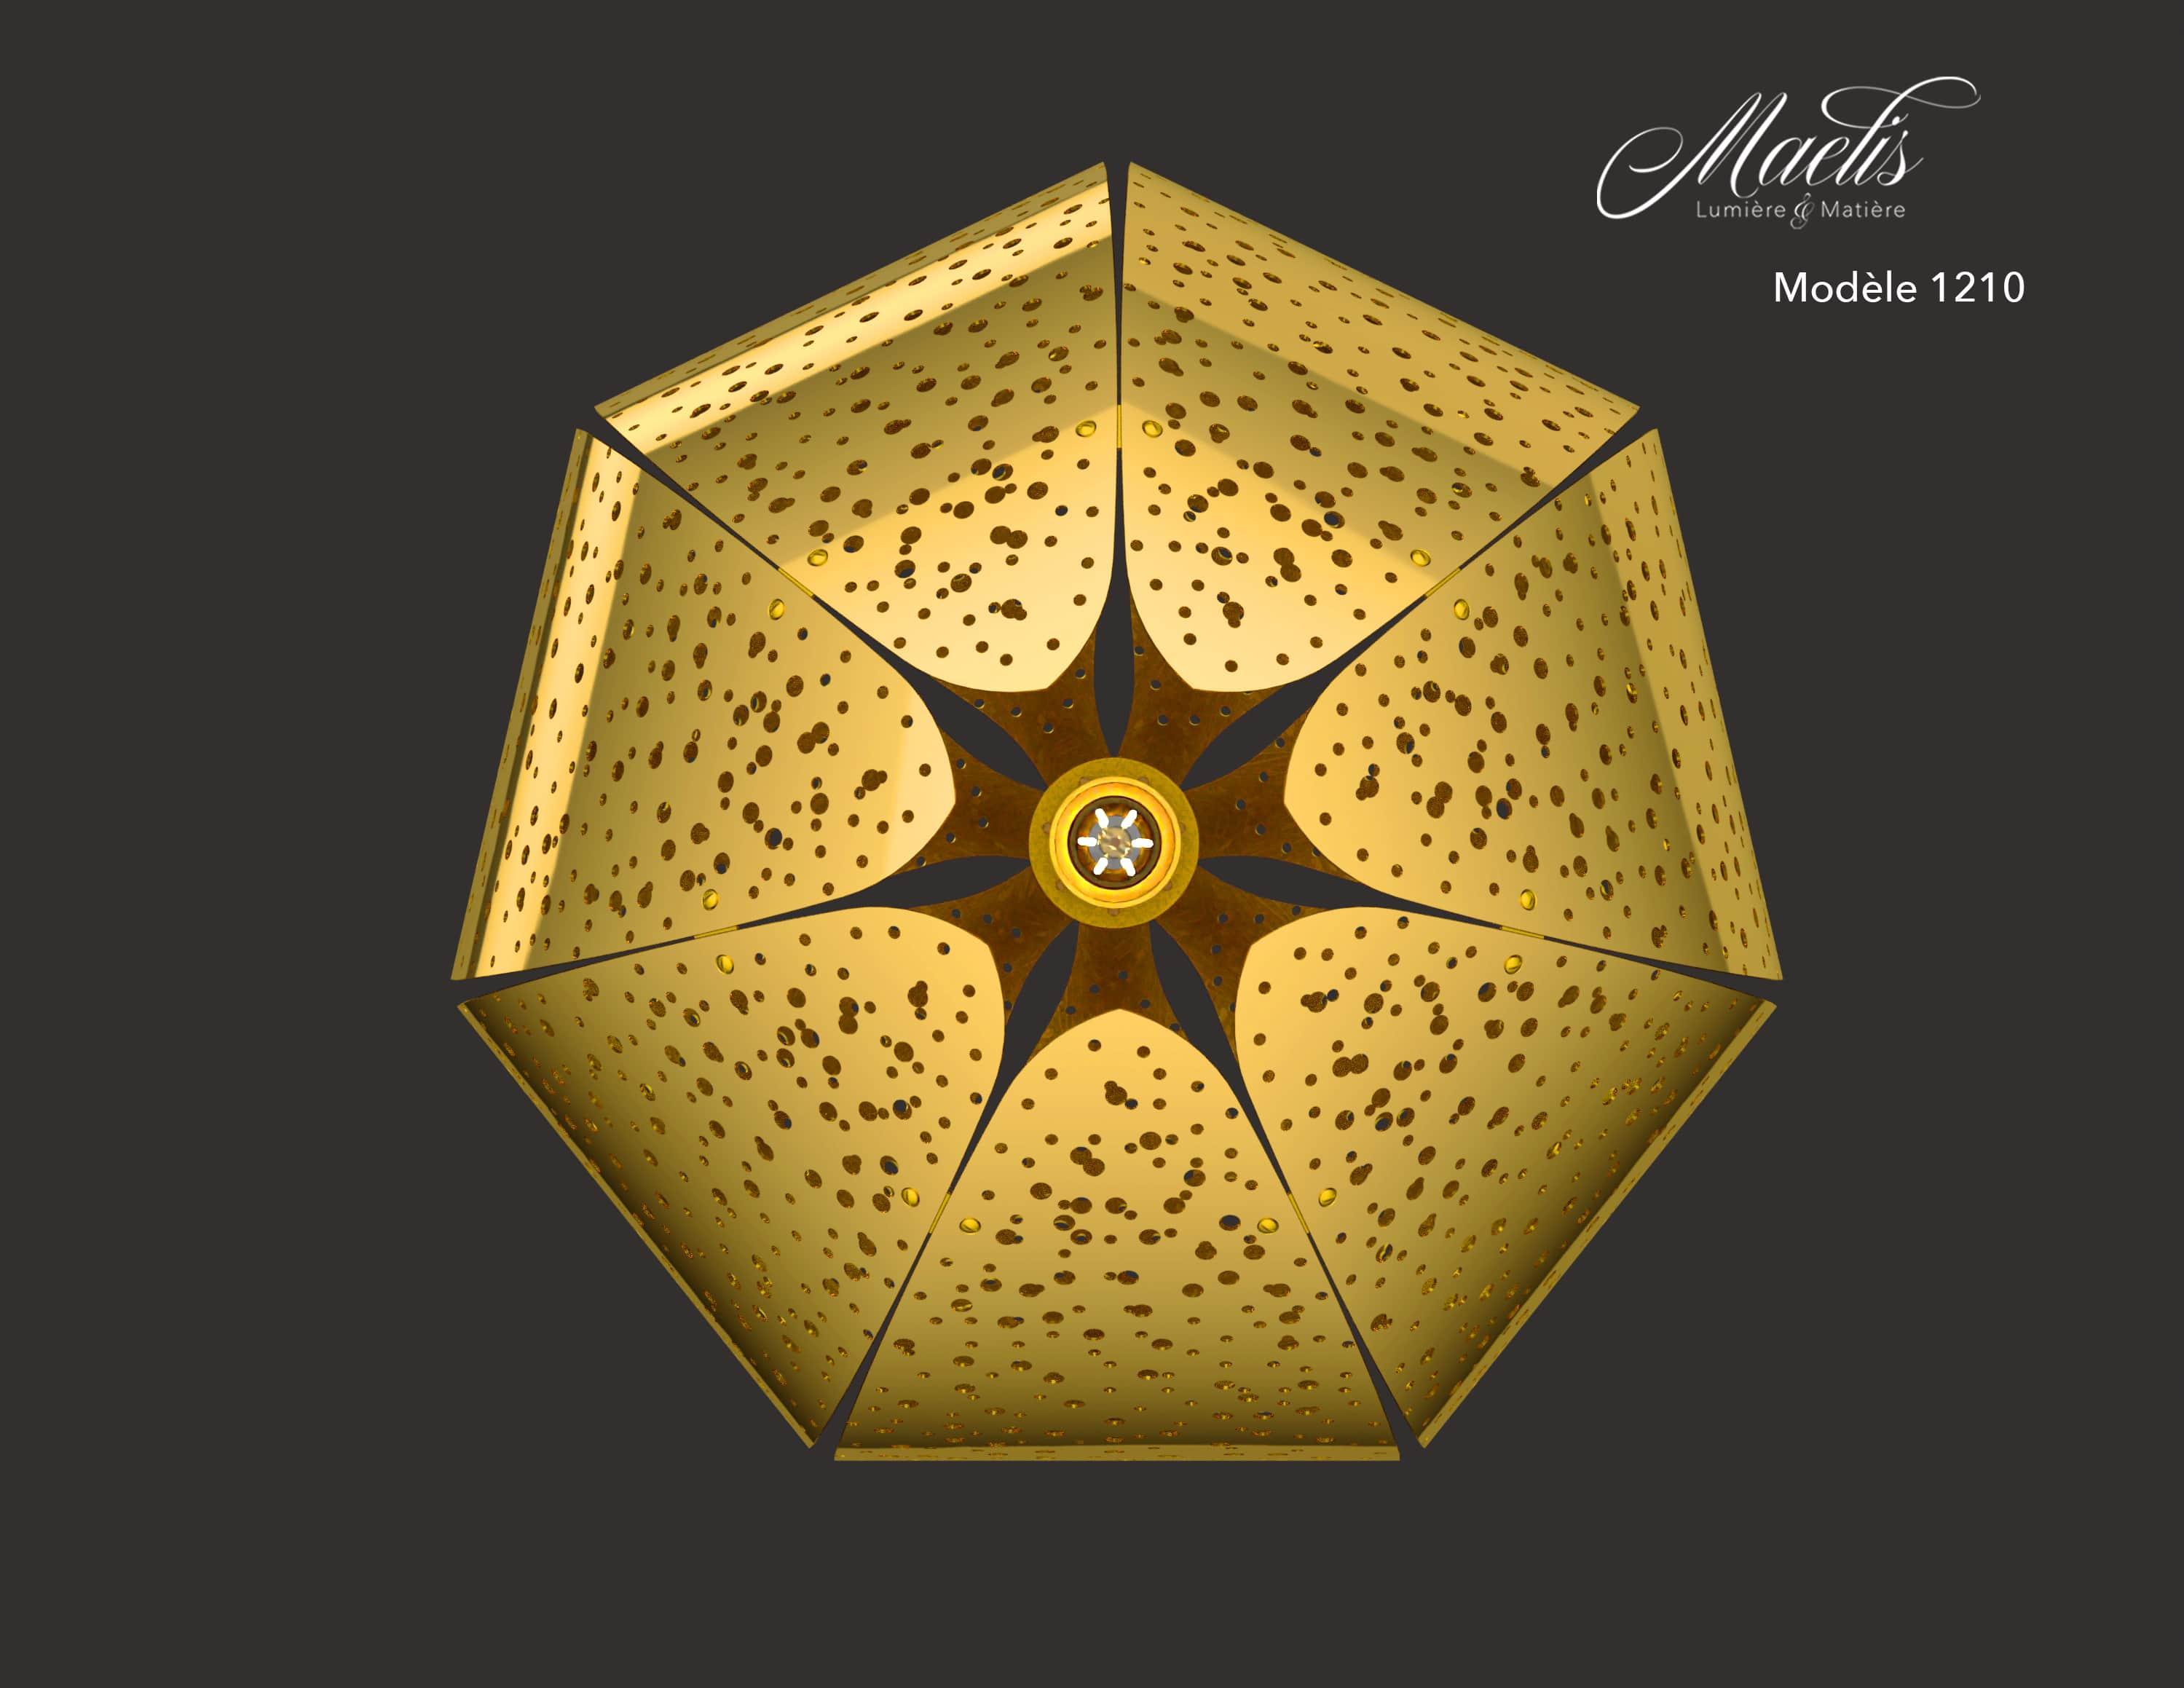 Maelis_Modele_1210_img3-min